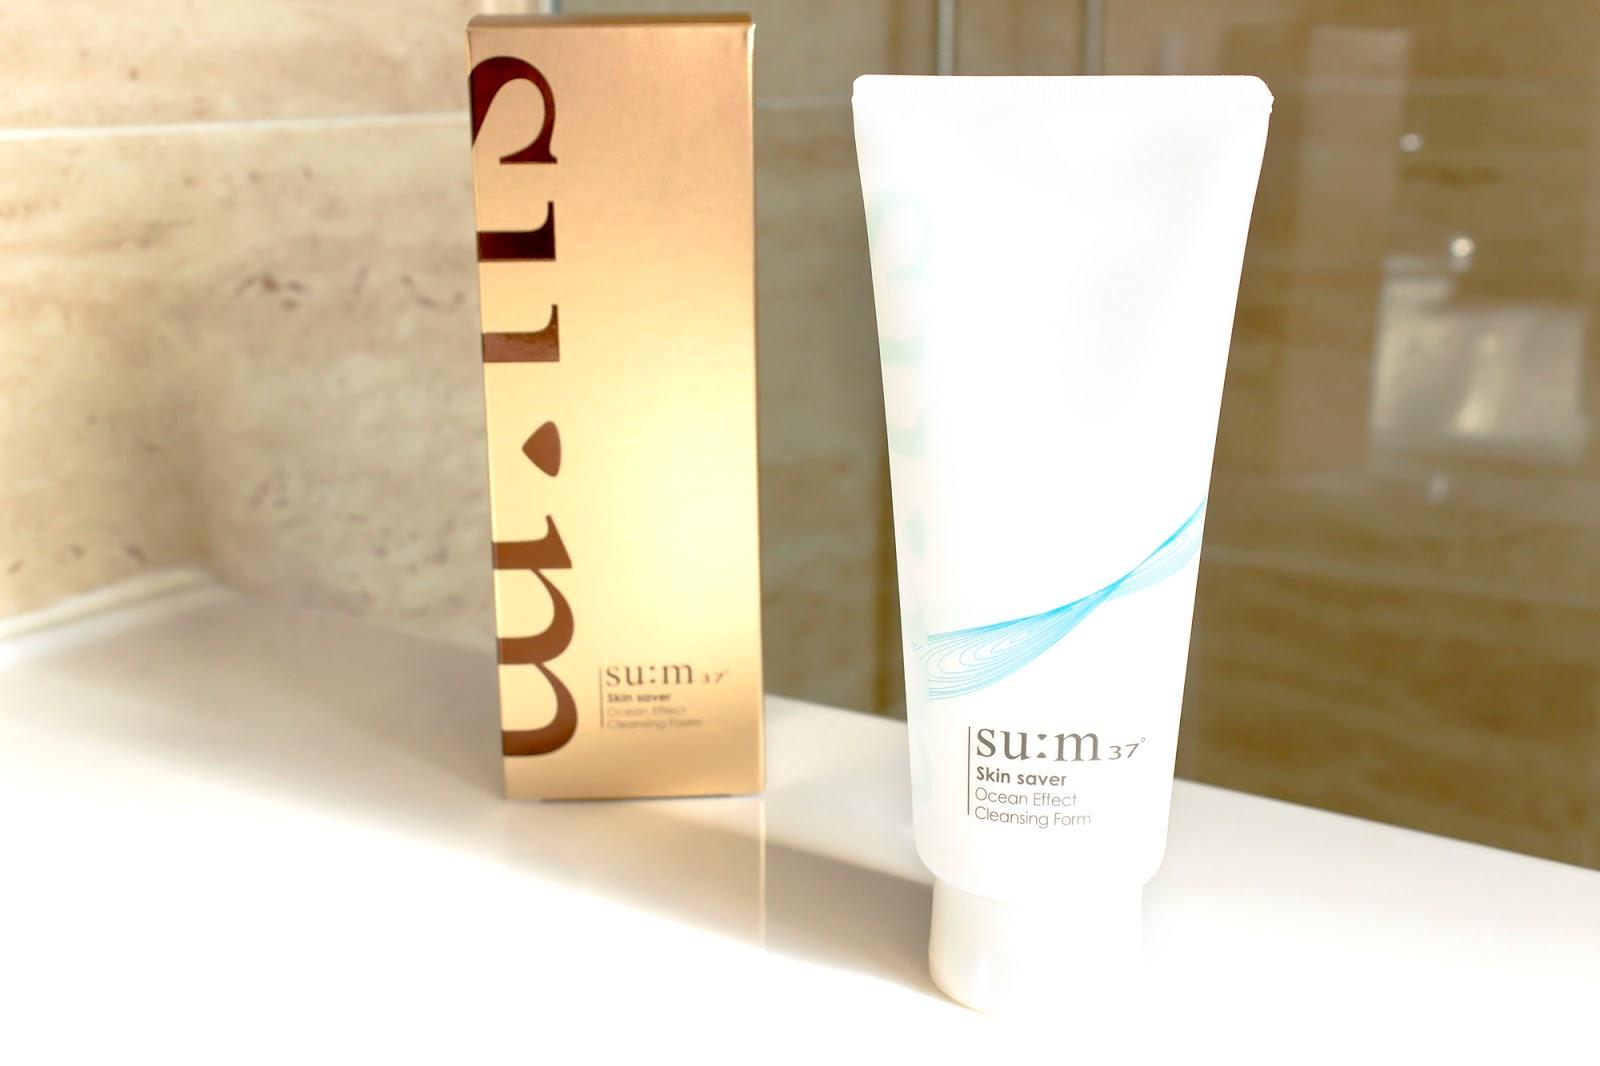 su:m37 Skin Saver Ocean Effect Cleansing Foam review